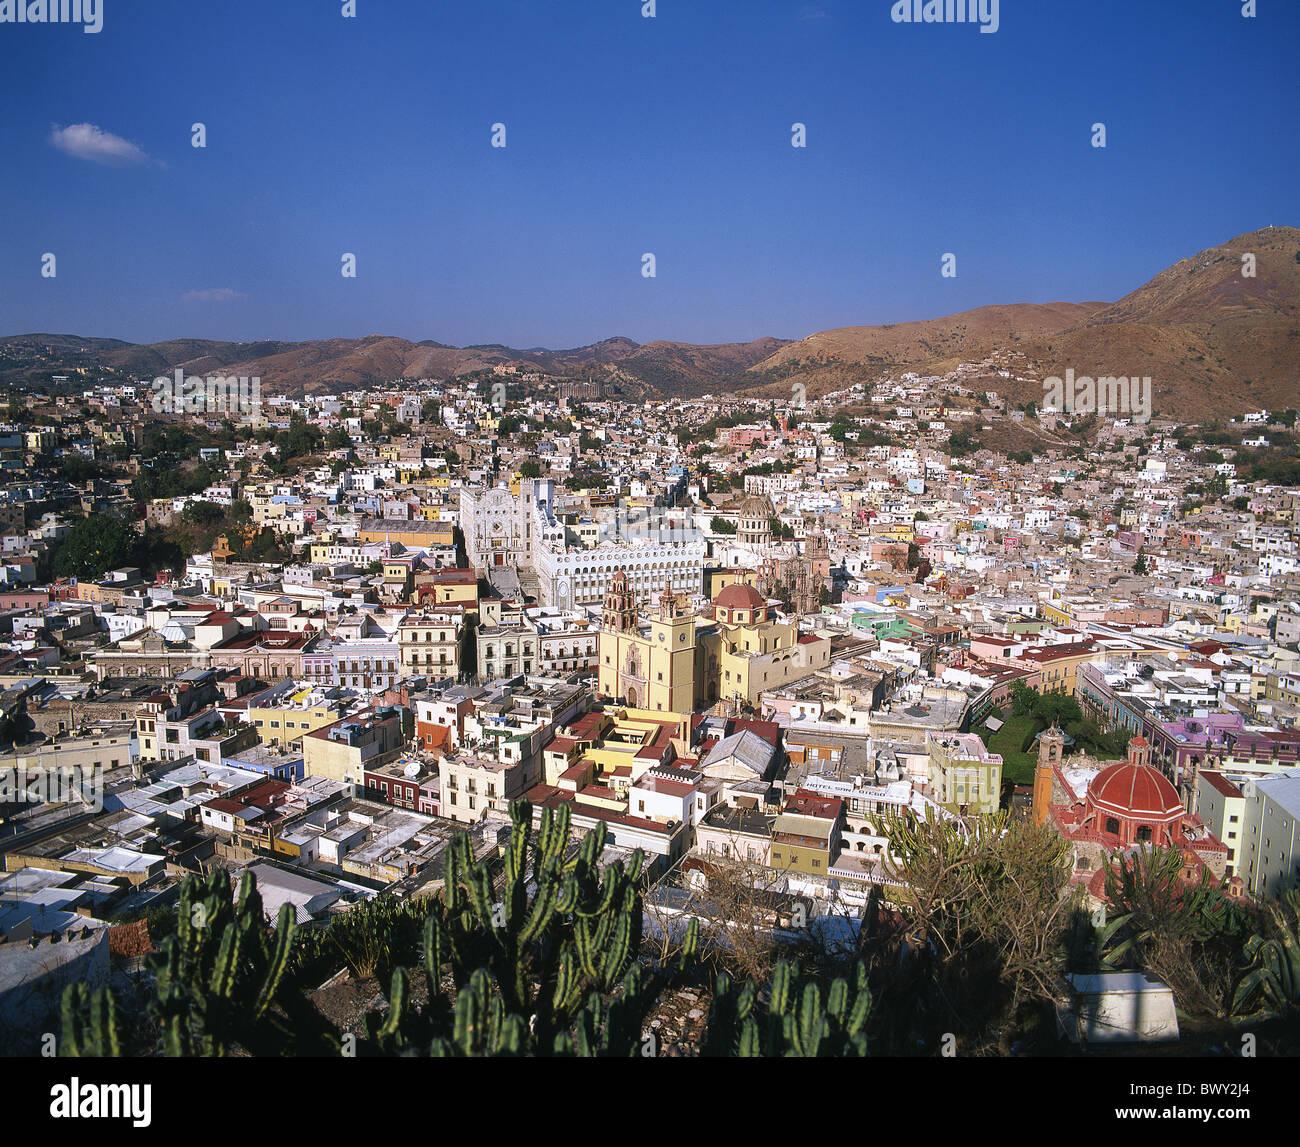 Guanajuato Mexico Central America Latin America towns cities overview - Stock Image